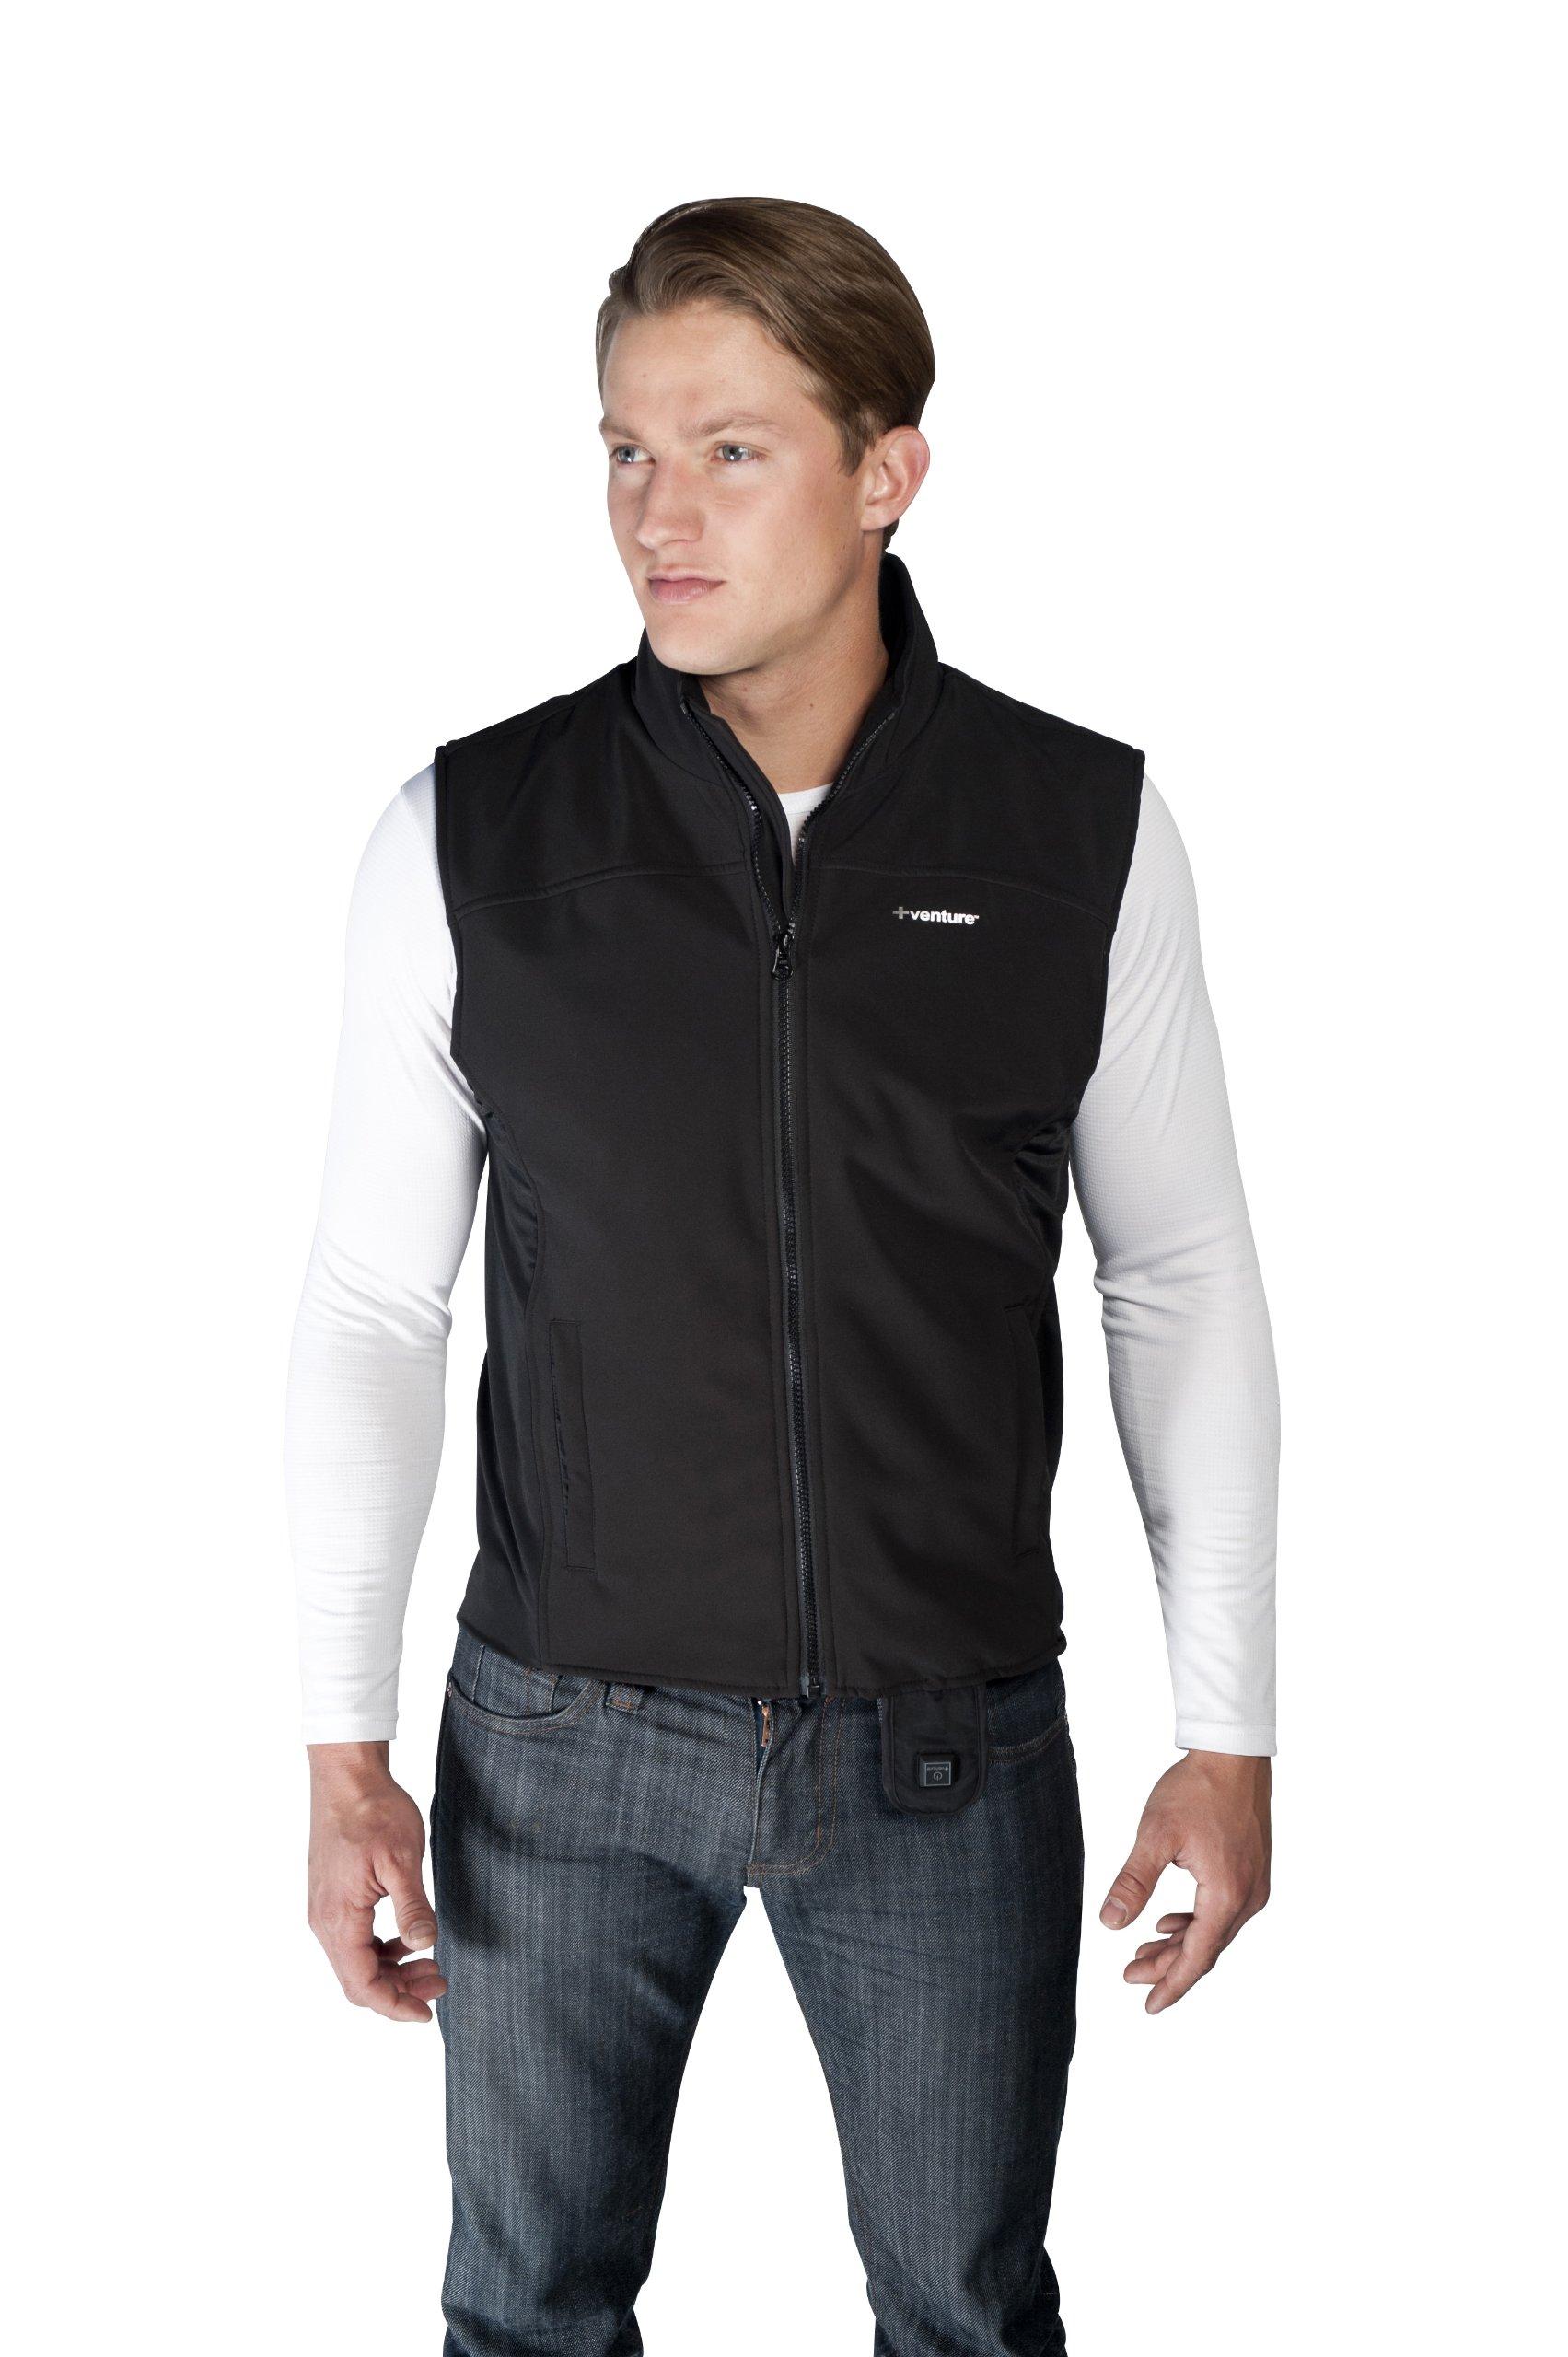 VentureHeat Quad-Zone Heated Soft Shell Motorcycle Vest (Black, Large)